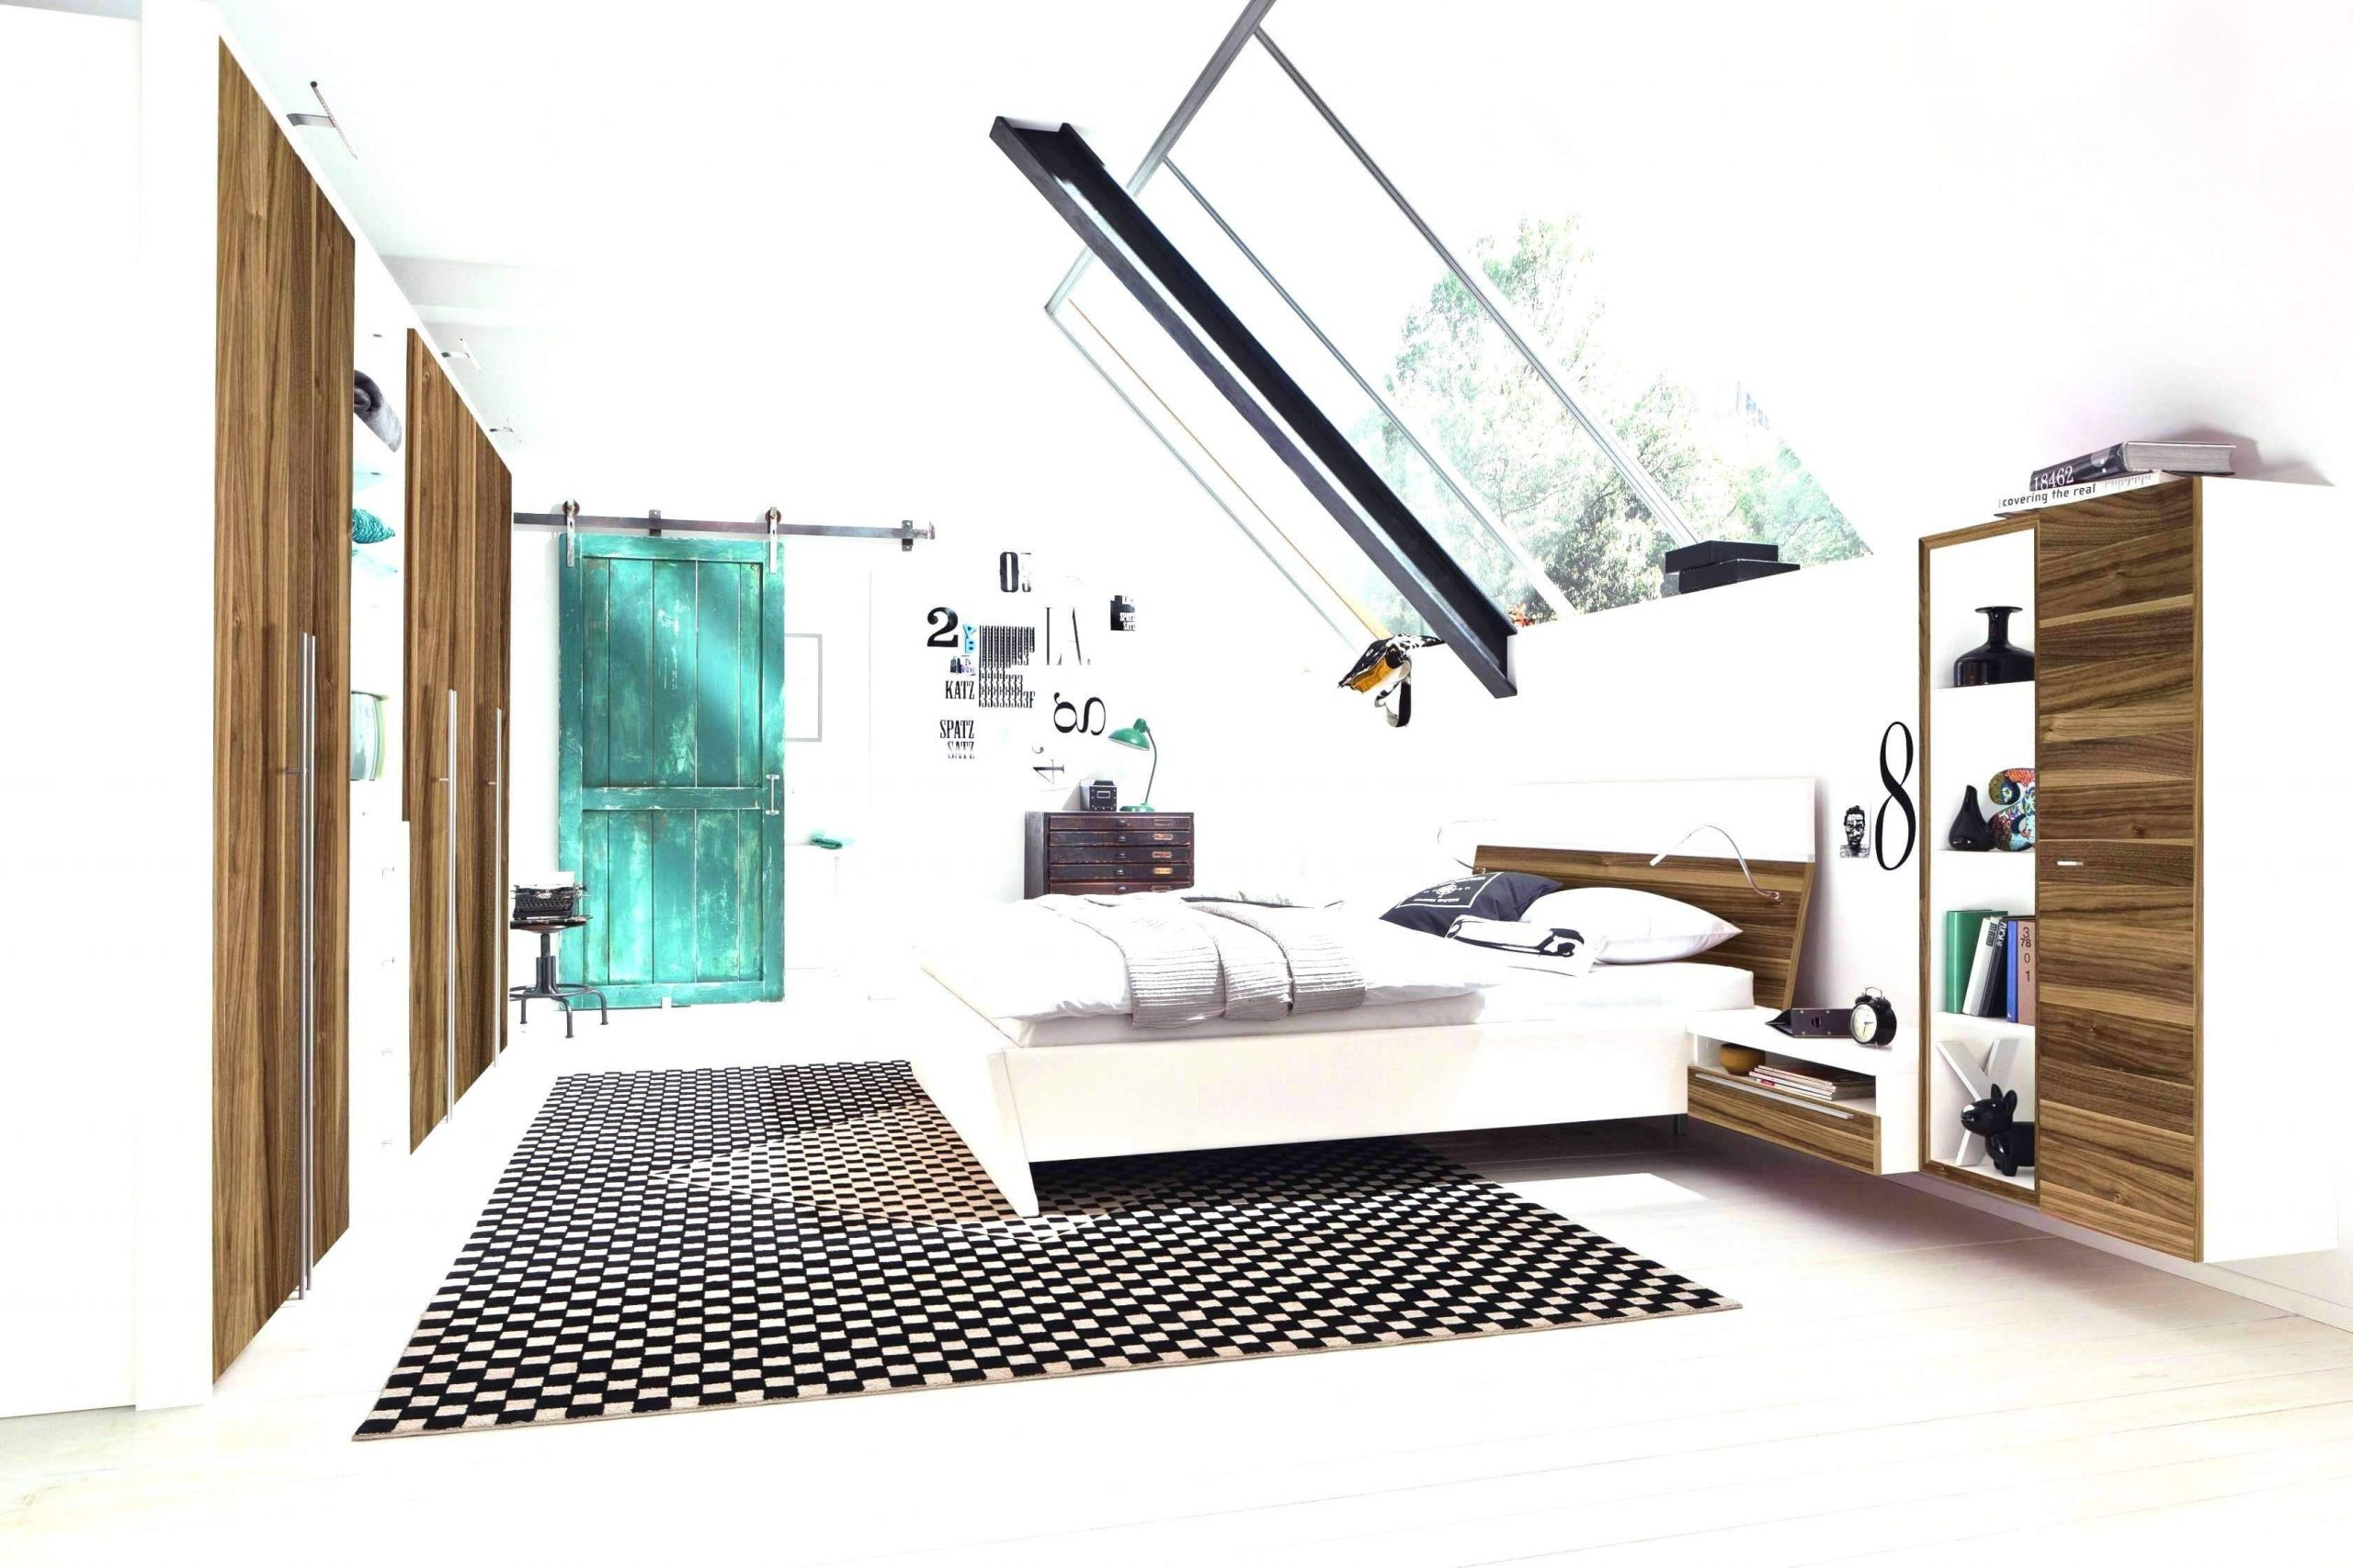 garten dekorieren ideen inspirierend lieblich design wohnzimmer regal ideen of garten dekorieren ideen scaled